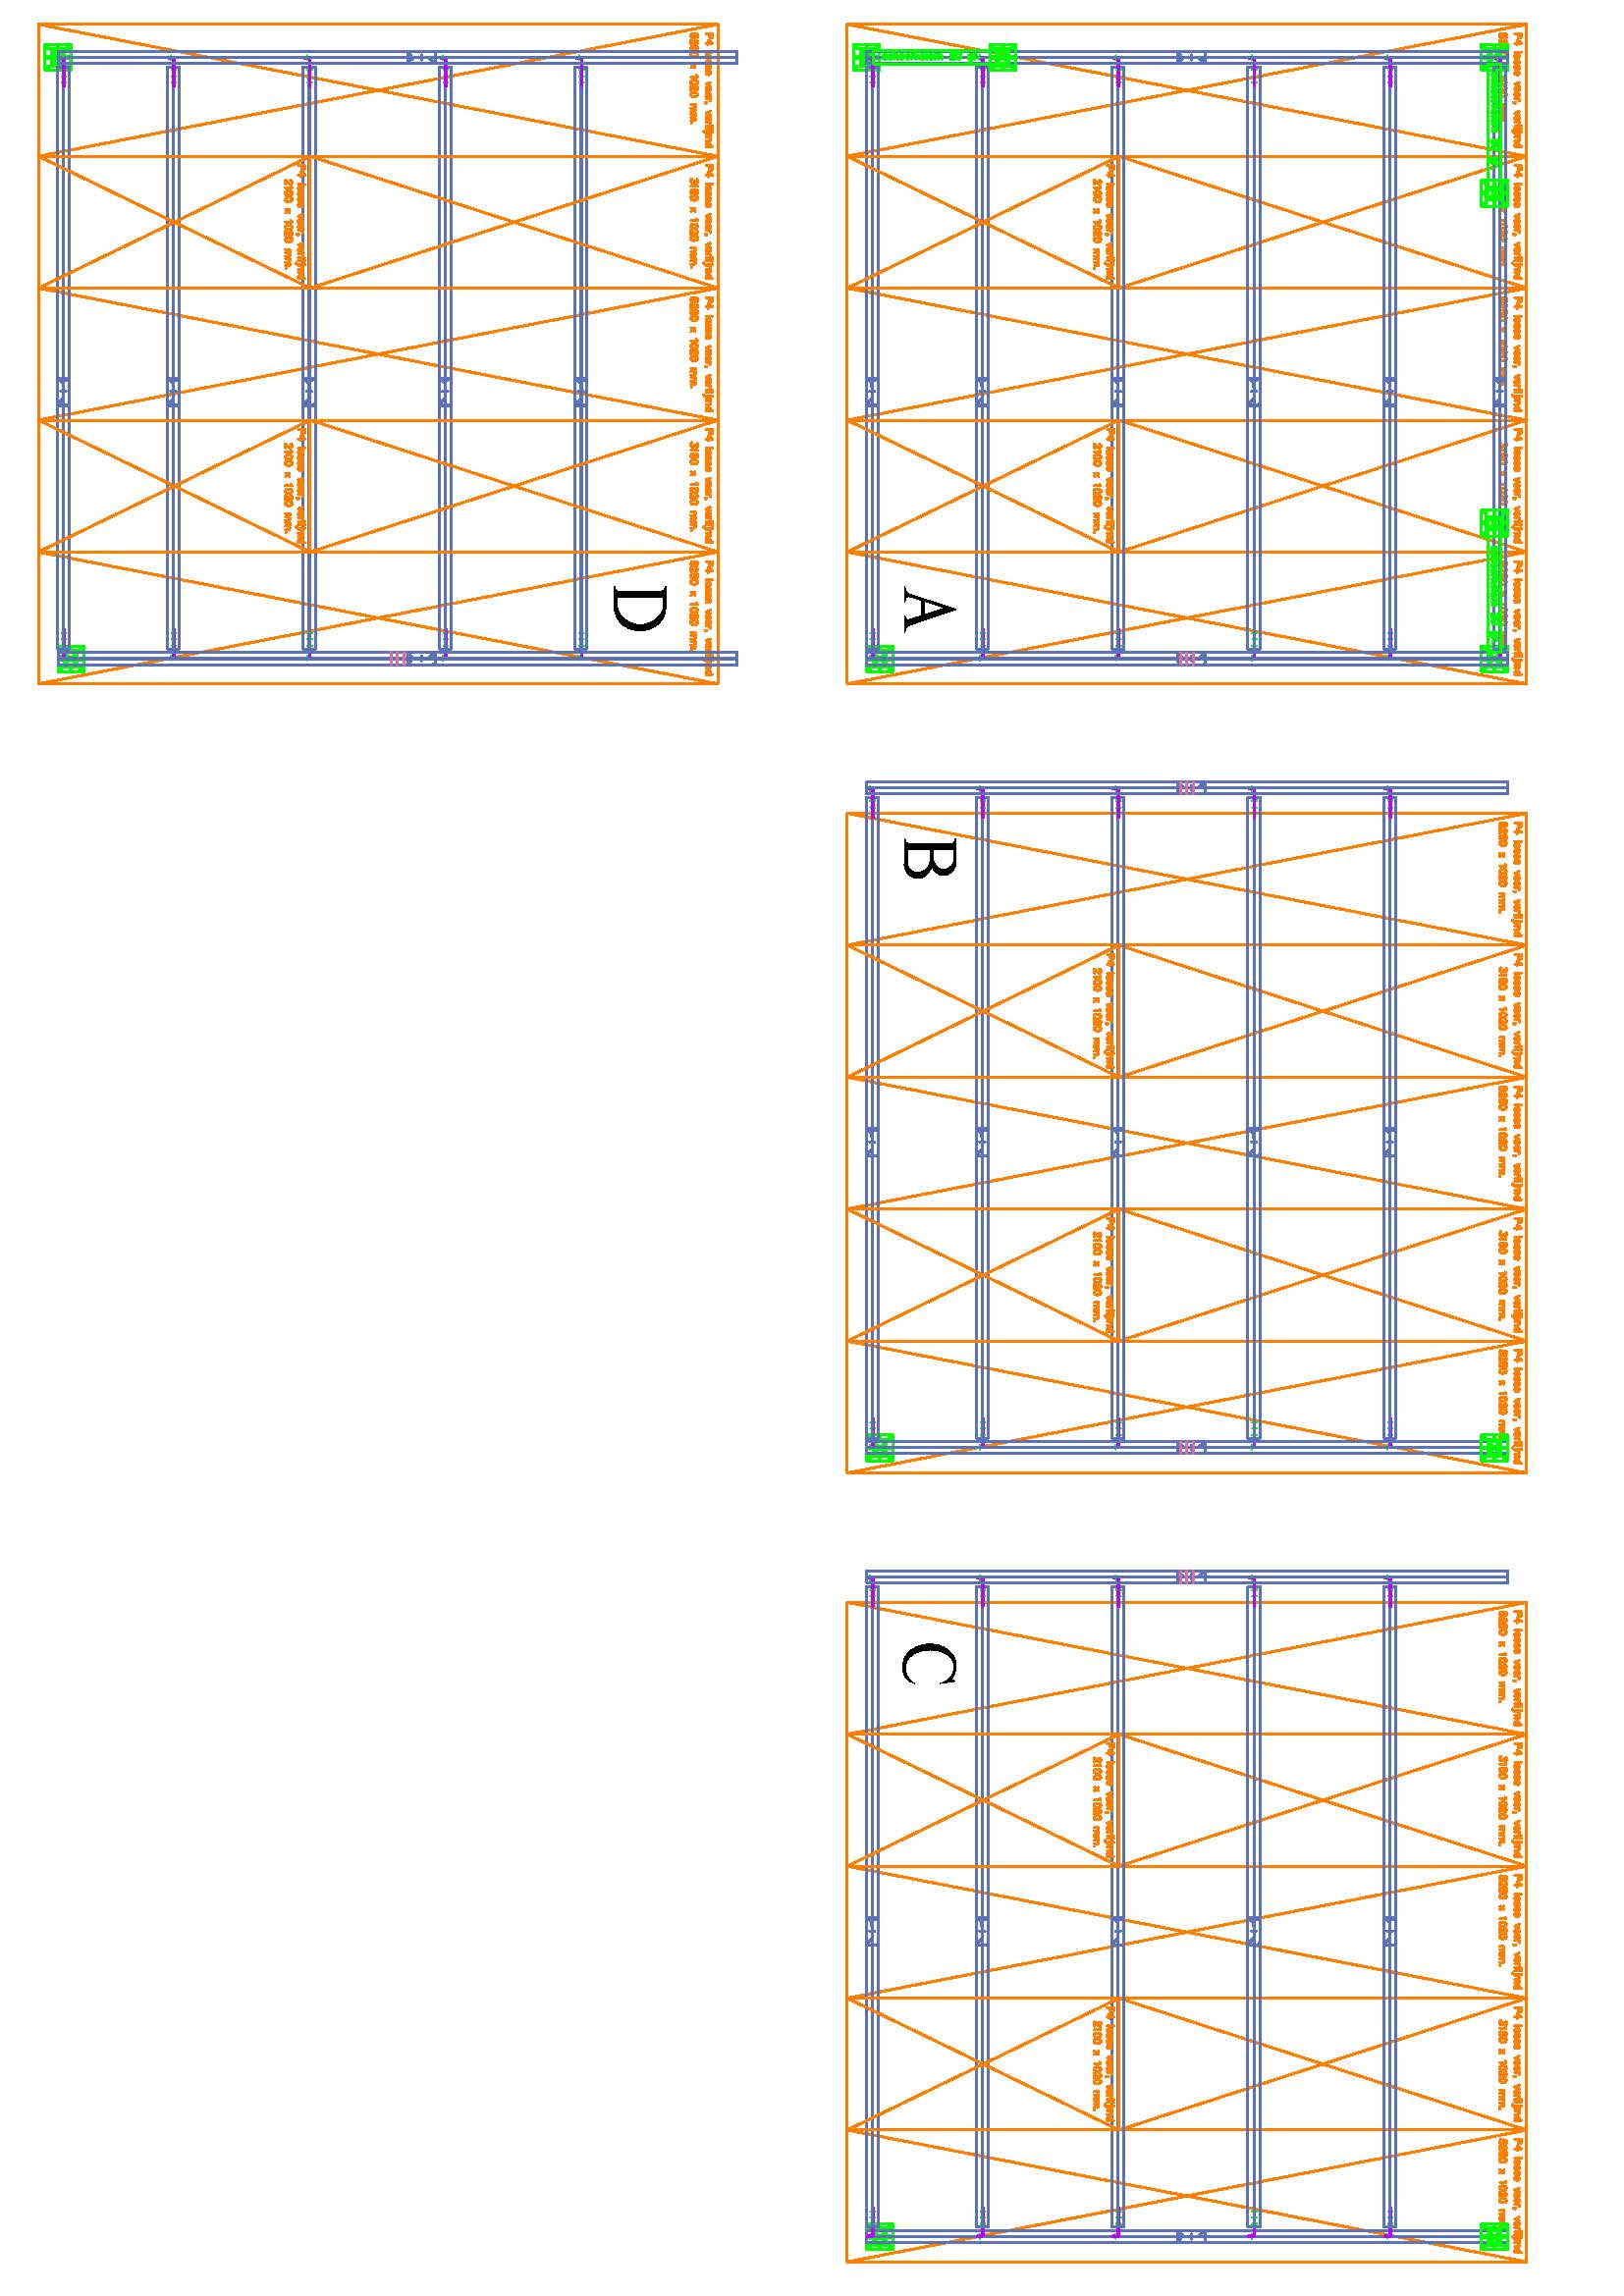 Etagevloer-magazijn-fabriek-tussenverdieping-etagevloer-mezzanine-goedkoop